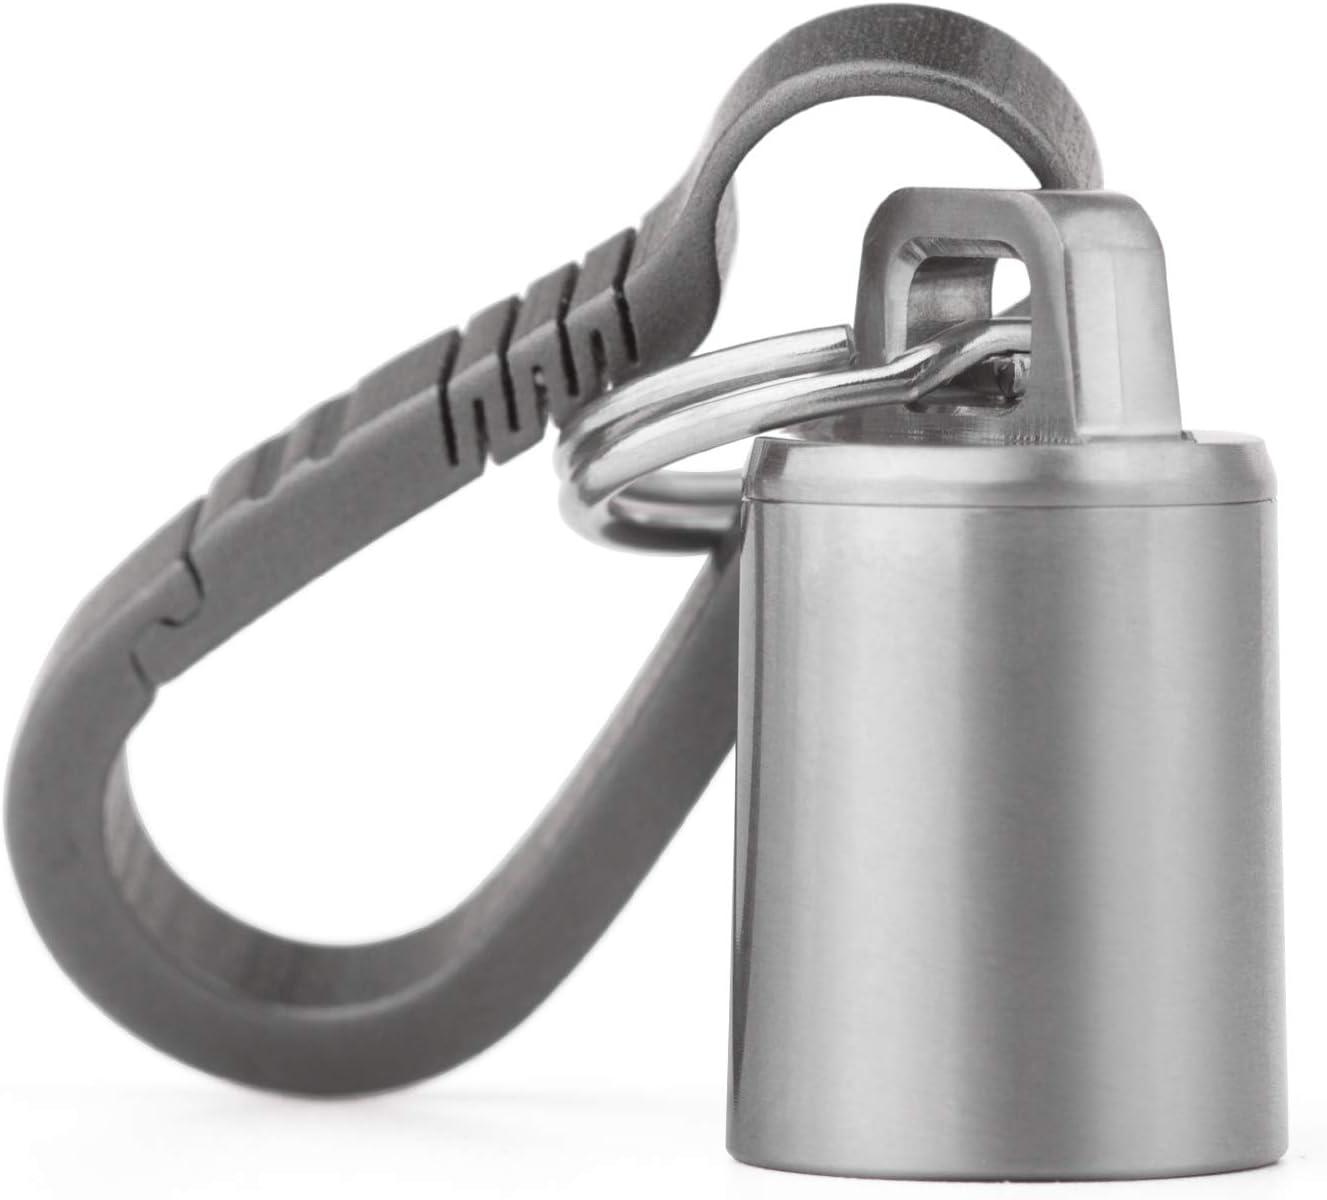 Latest item Micro Keychain Pill Holder.TISUR Super beauty product restock quality top! Titanium Waterproof Case P